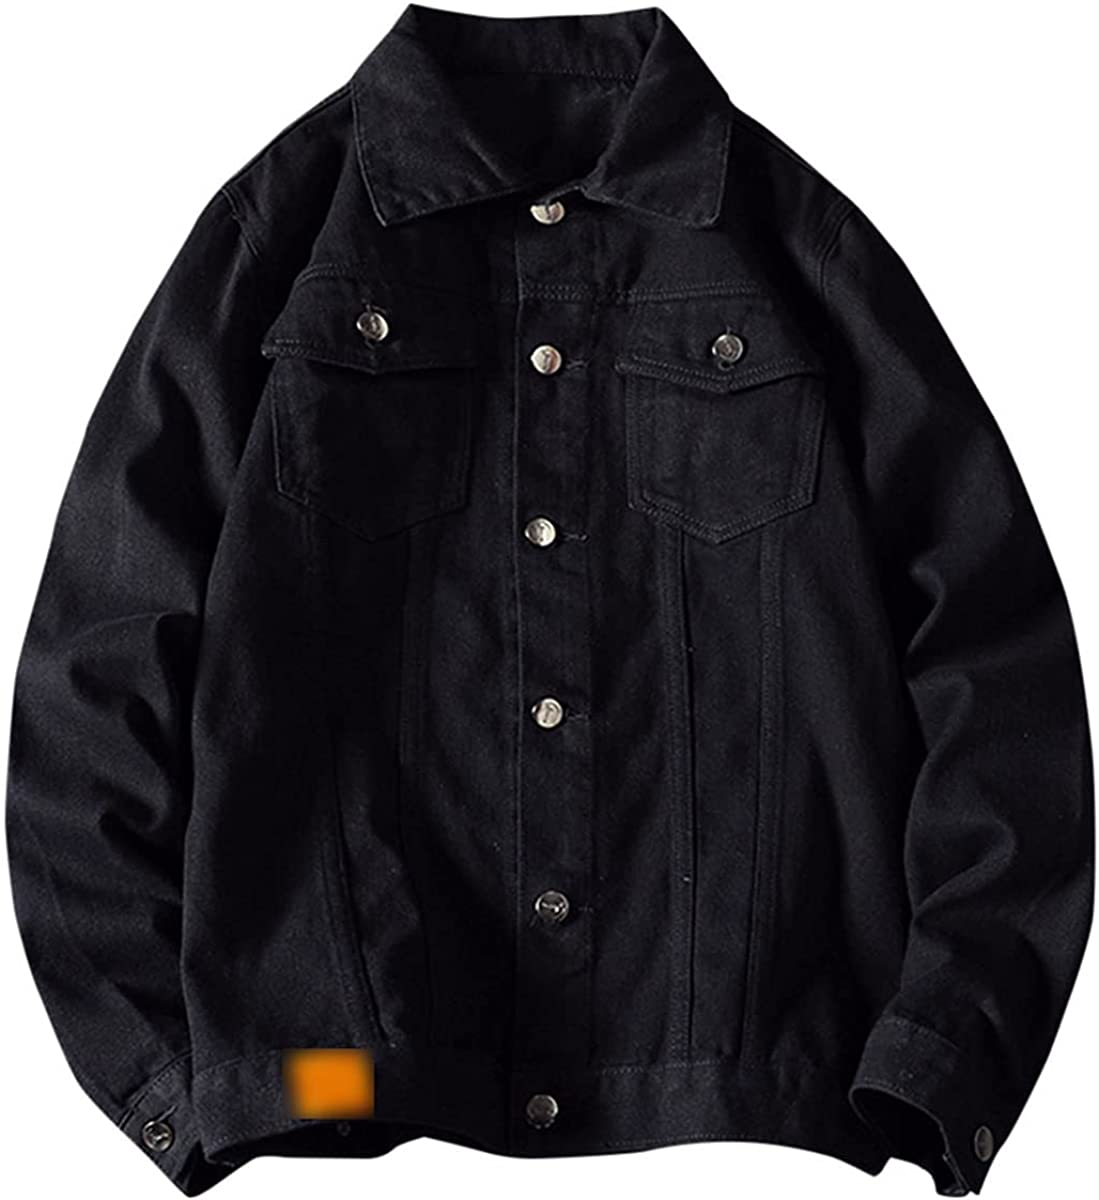 Men's Denim Jacket Trendy Fashion Bomber Jacket Casual Jacket Streetwear